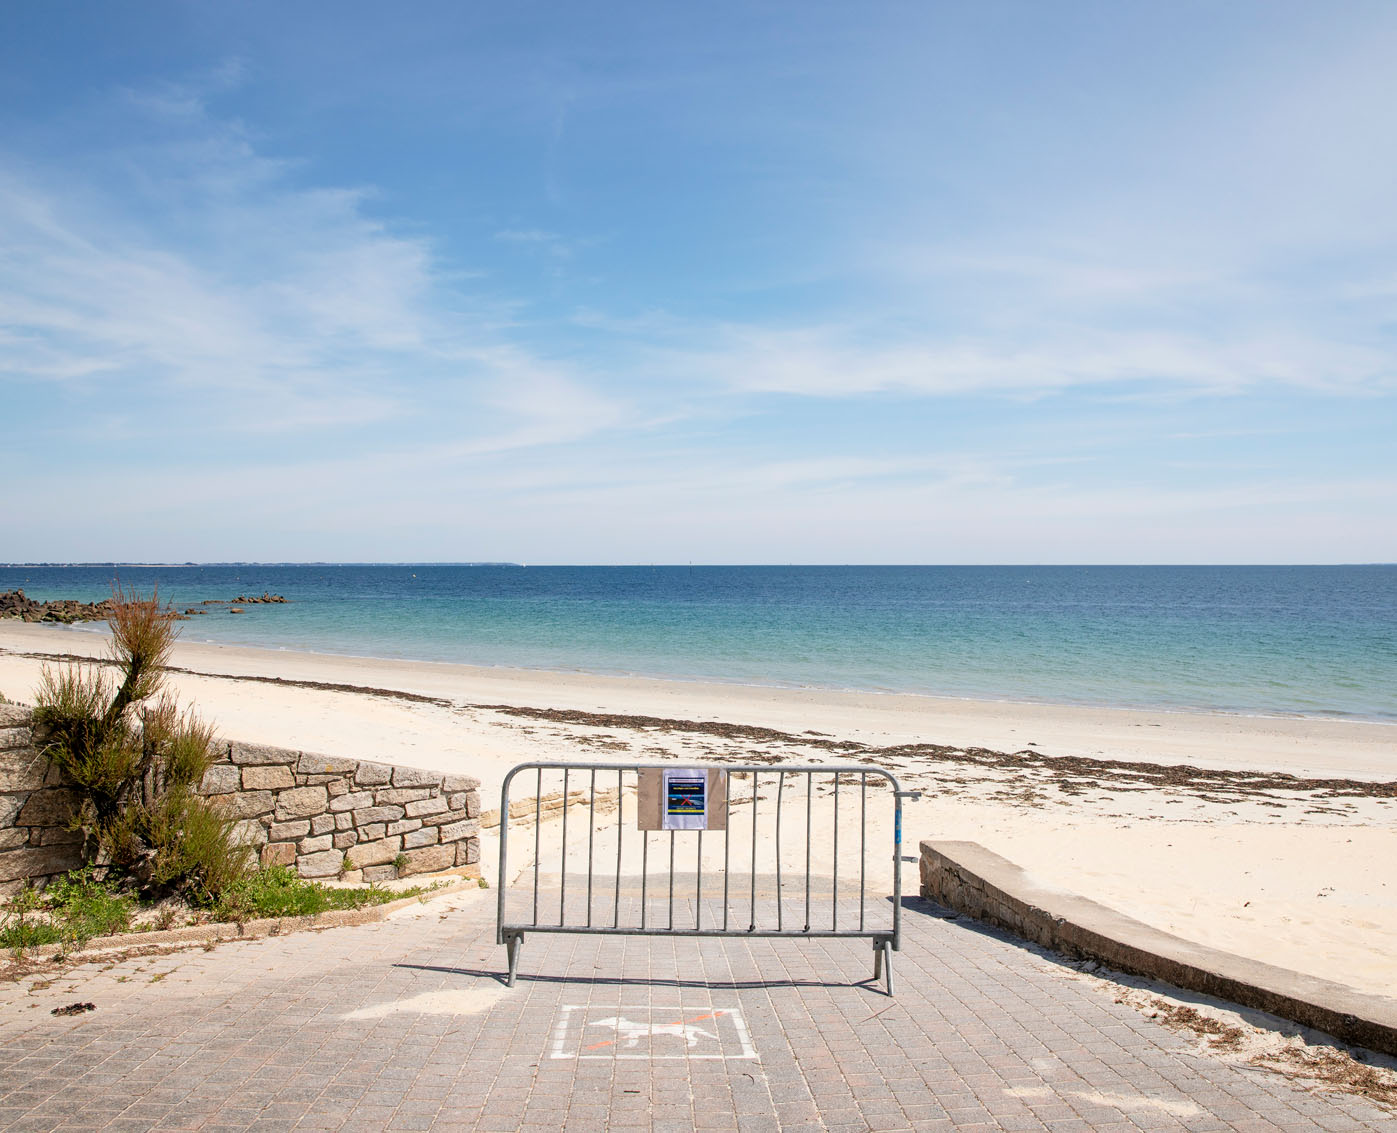 Samedi 17 mai 2020, plage de Légenèse à Carnac